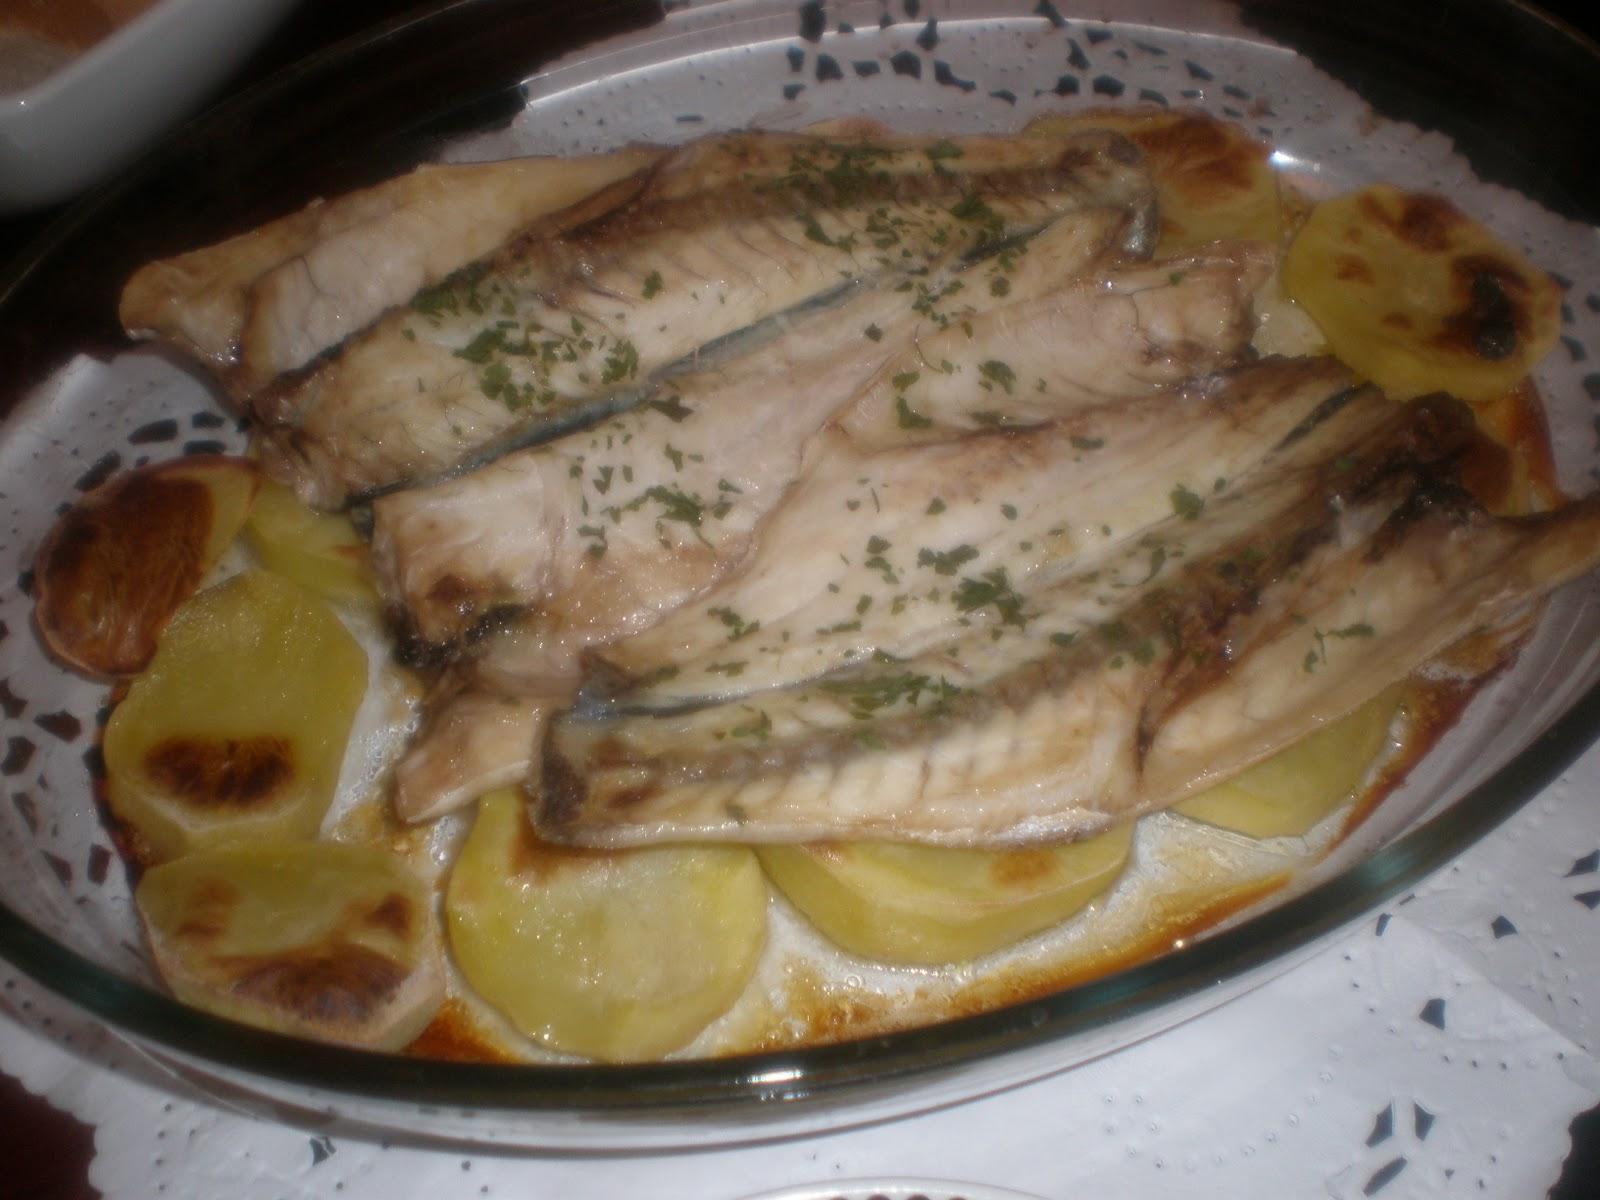 La cocina seg n ereaga lubina al horno - Cocina al horno ...